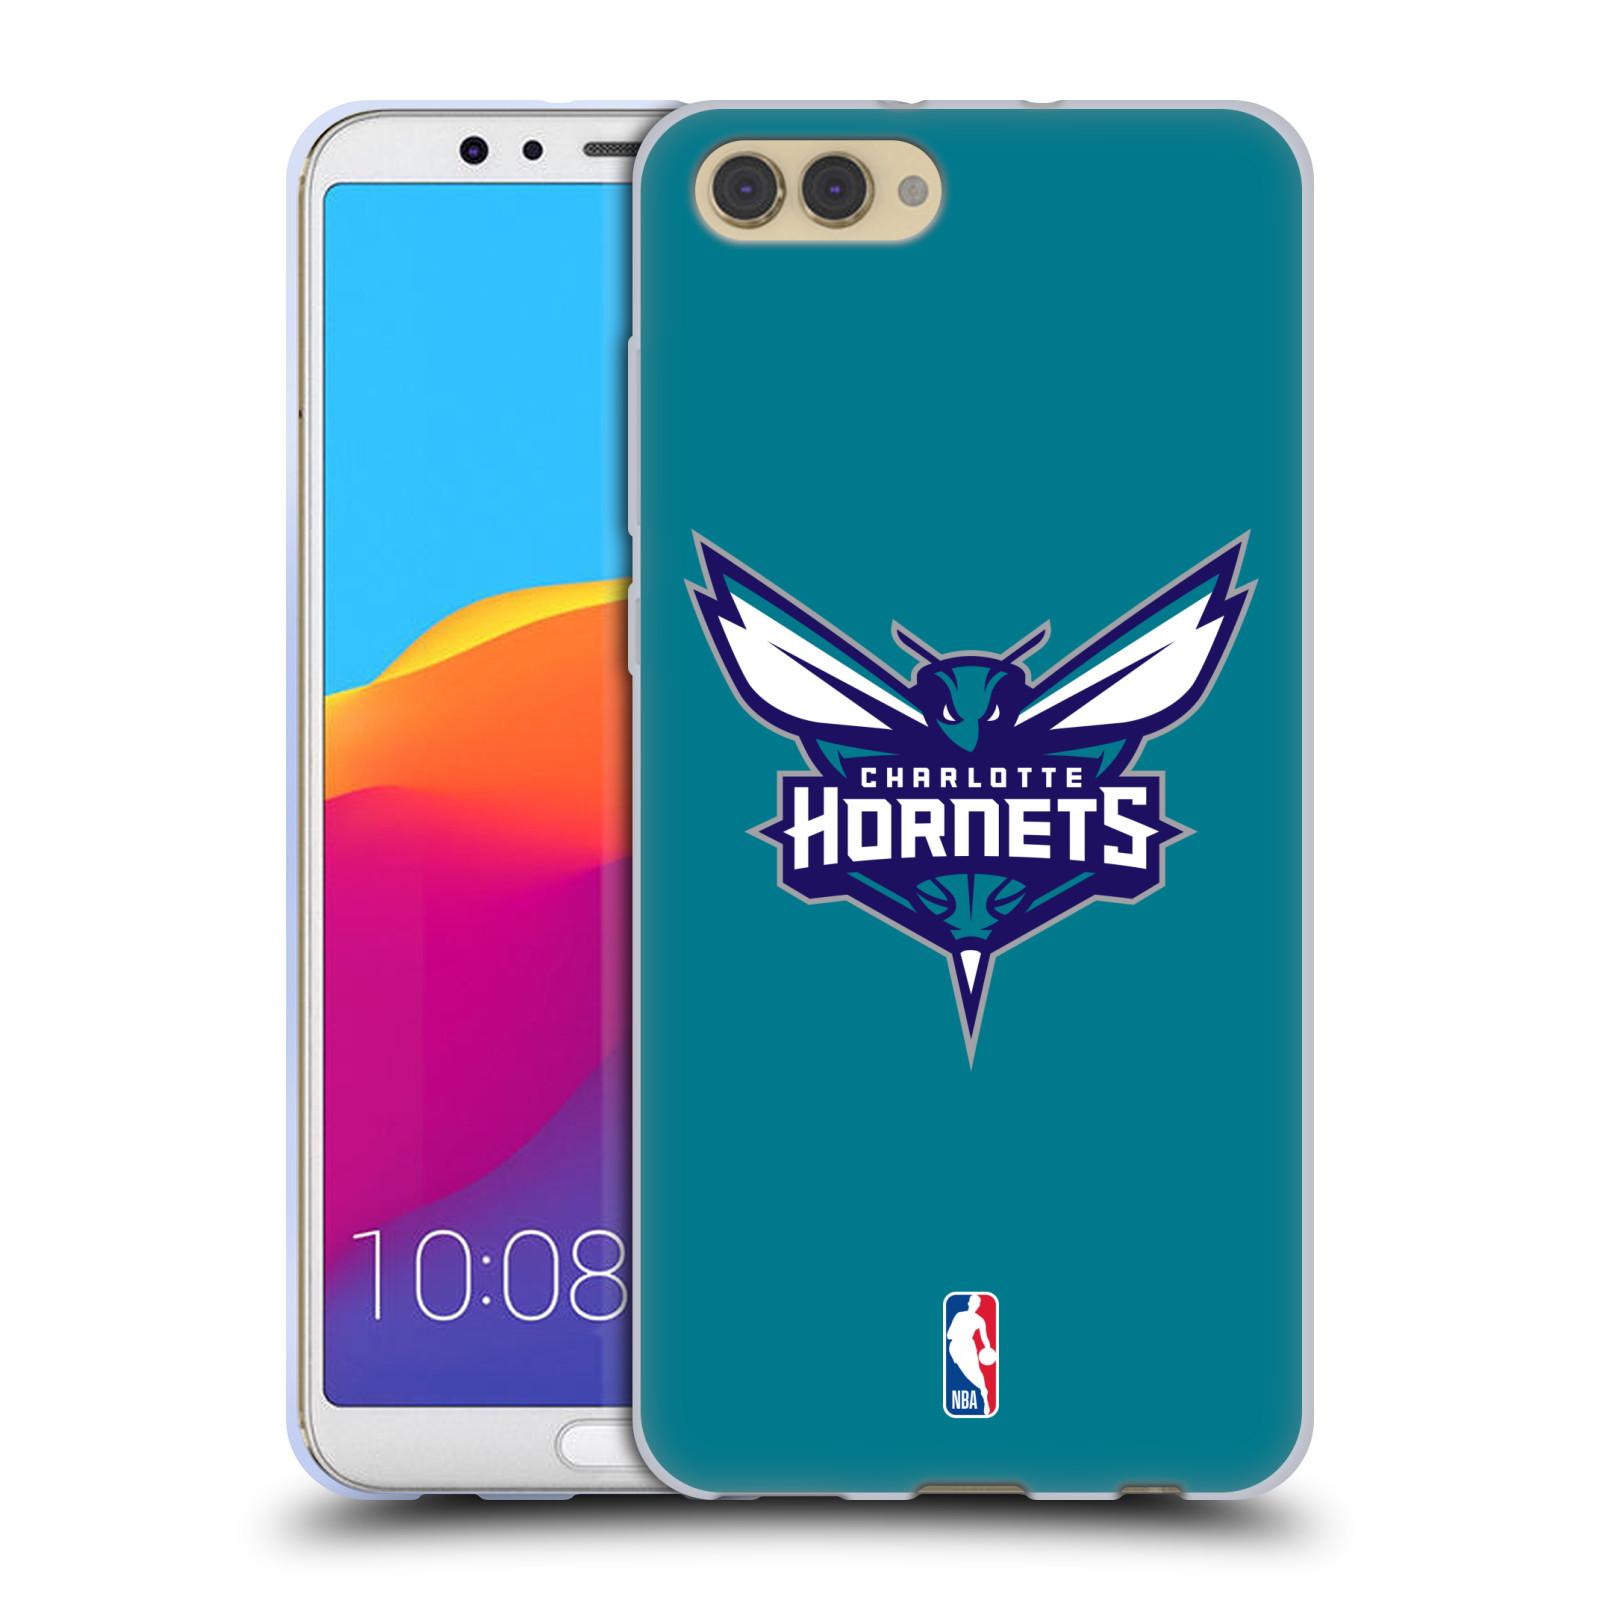 HEAD CASE silikonový obal na mobil Huawei HONOR VIEW 10 / V10 NBA Basketbalový klub Charlotte Hornets logo